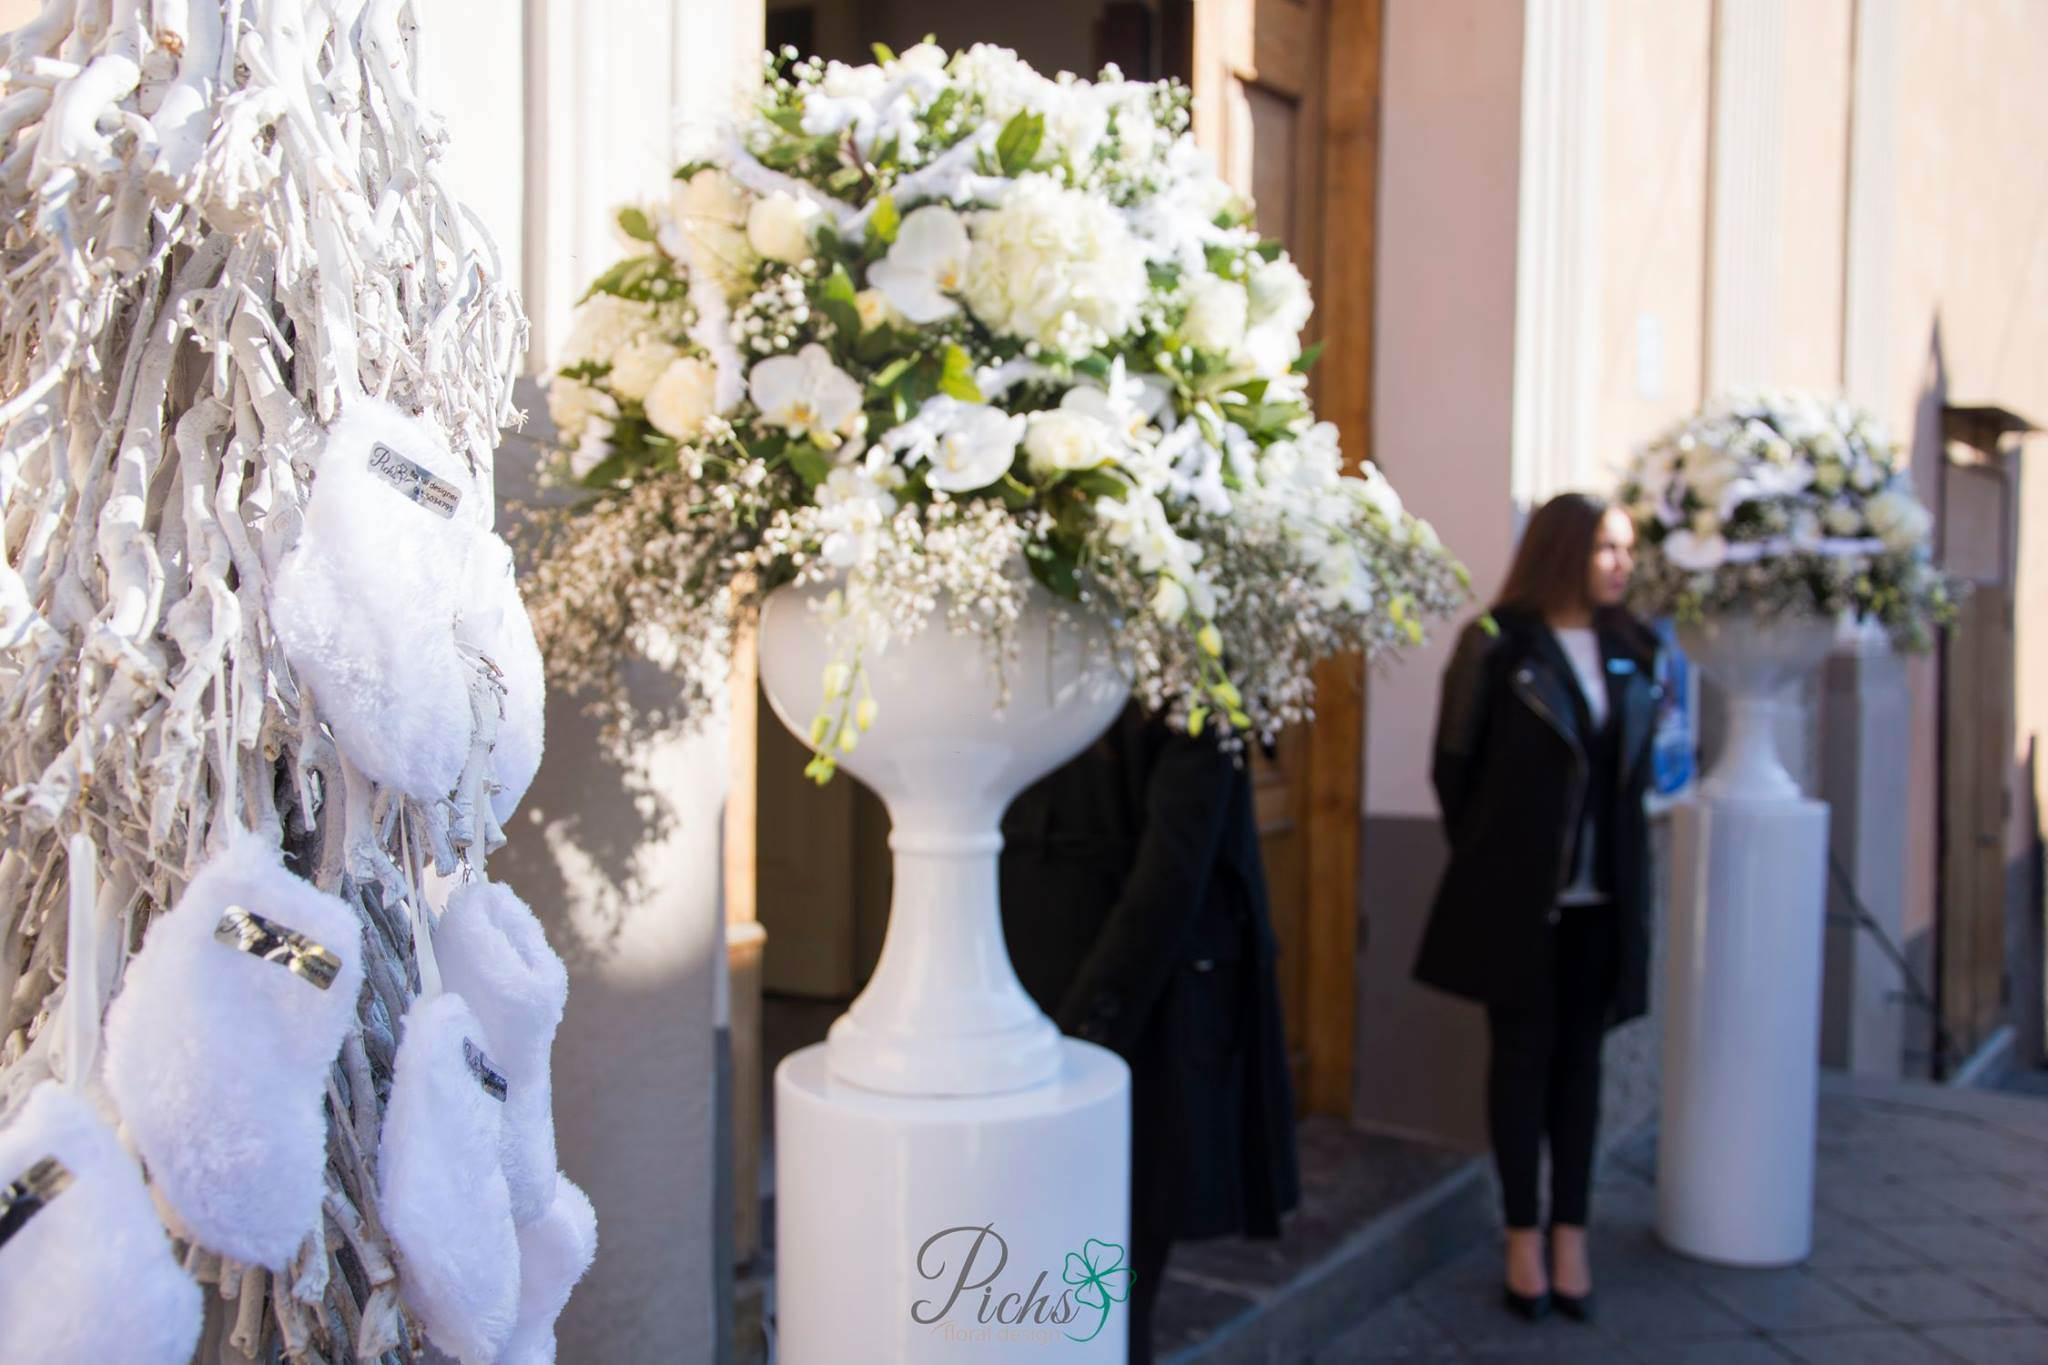 Matrimonio A Natale Idee : Matrimonio natale 9 weddings